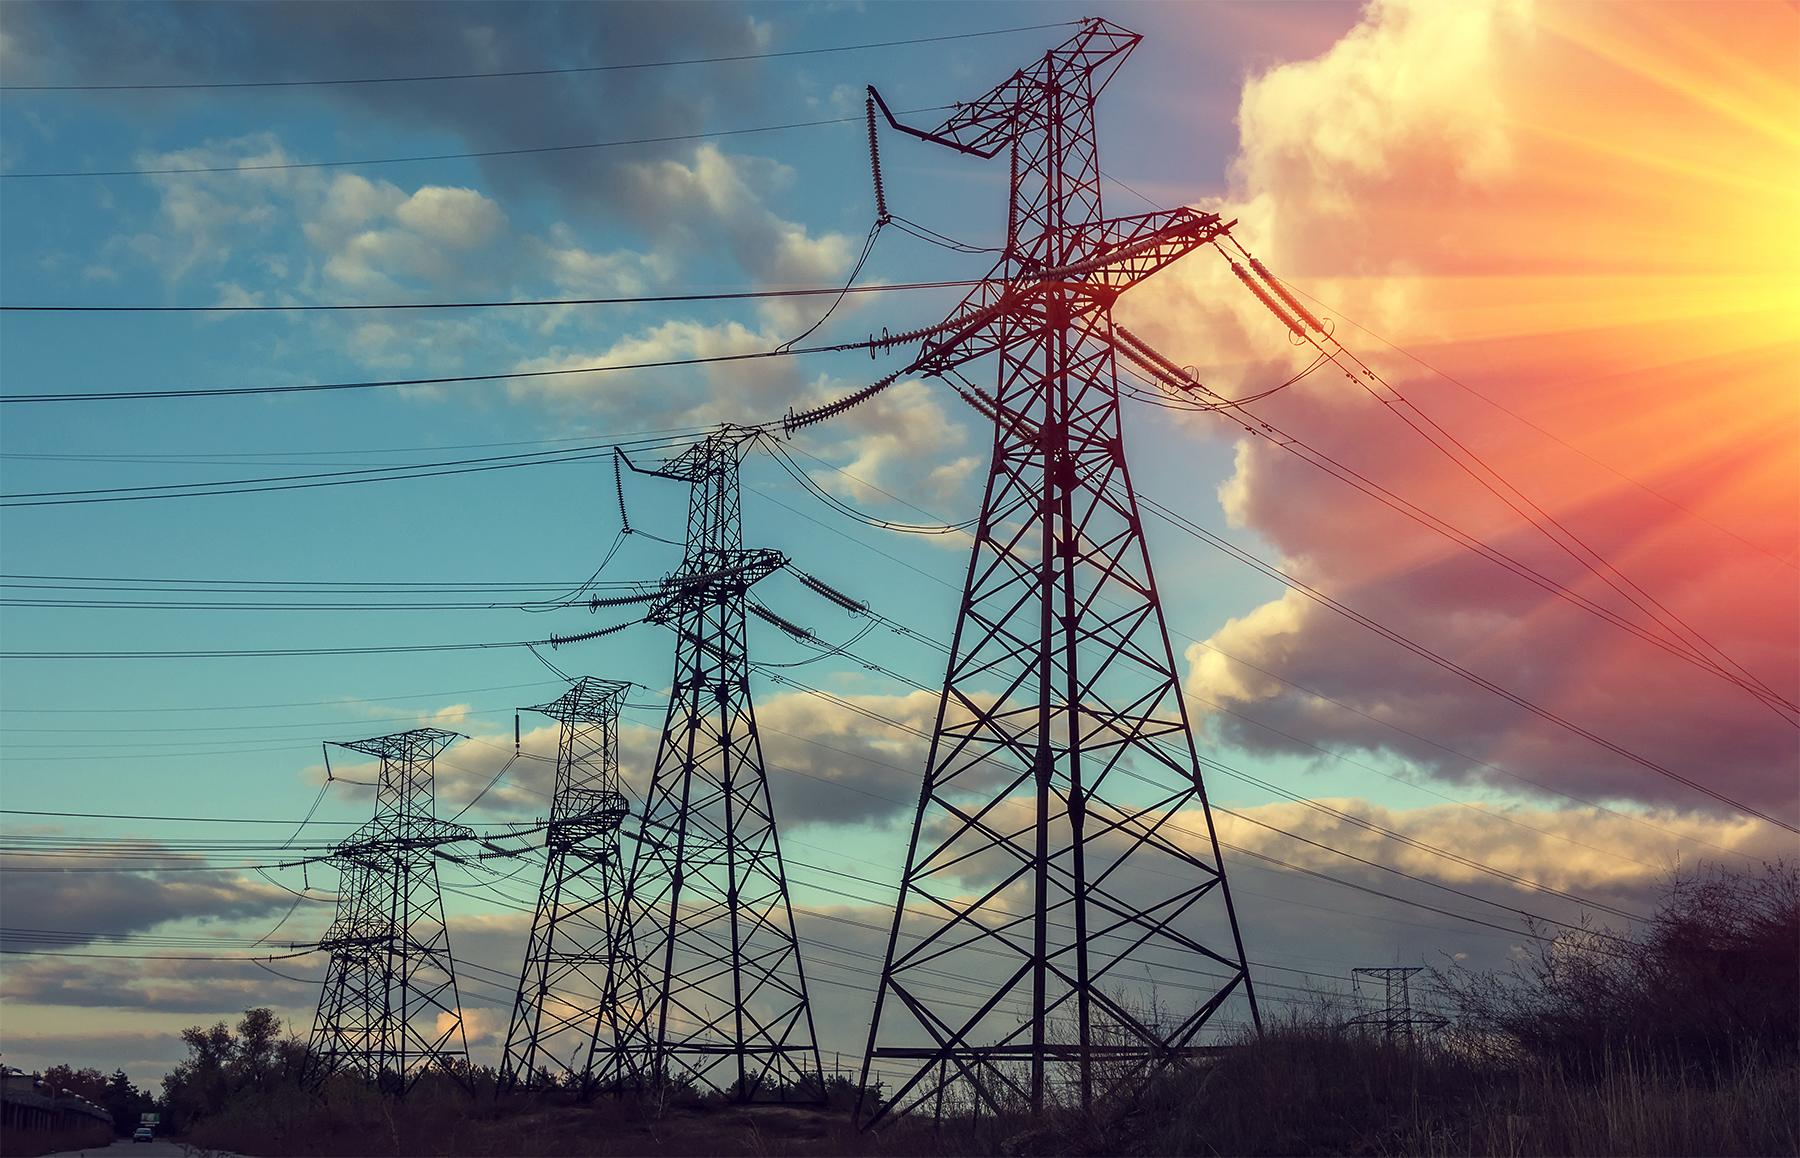 AE Utilities